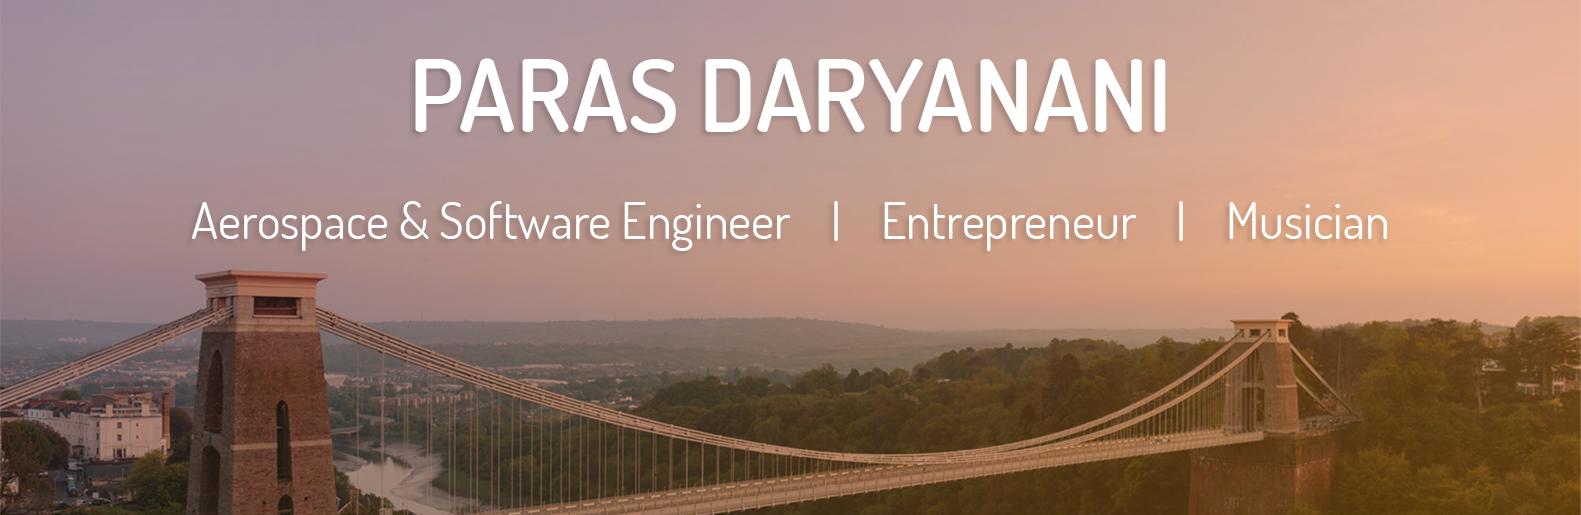 banner that says Paras Daryanani, aerospace and software engineer, entrepreneur, musician